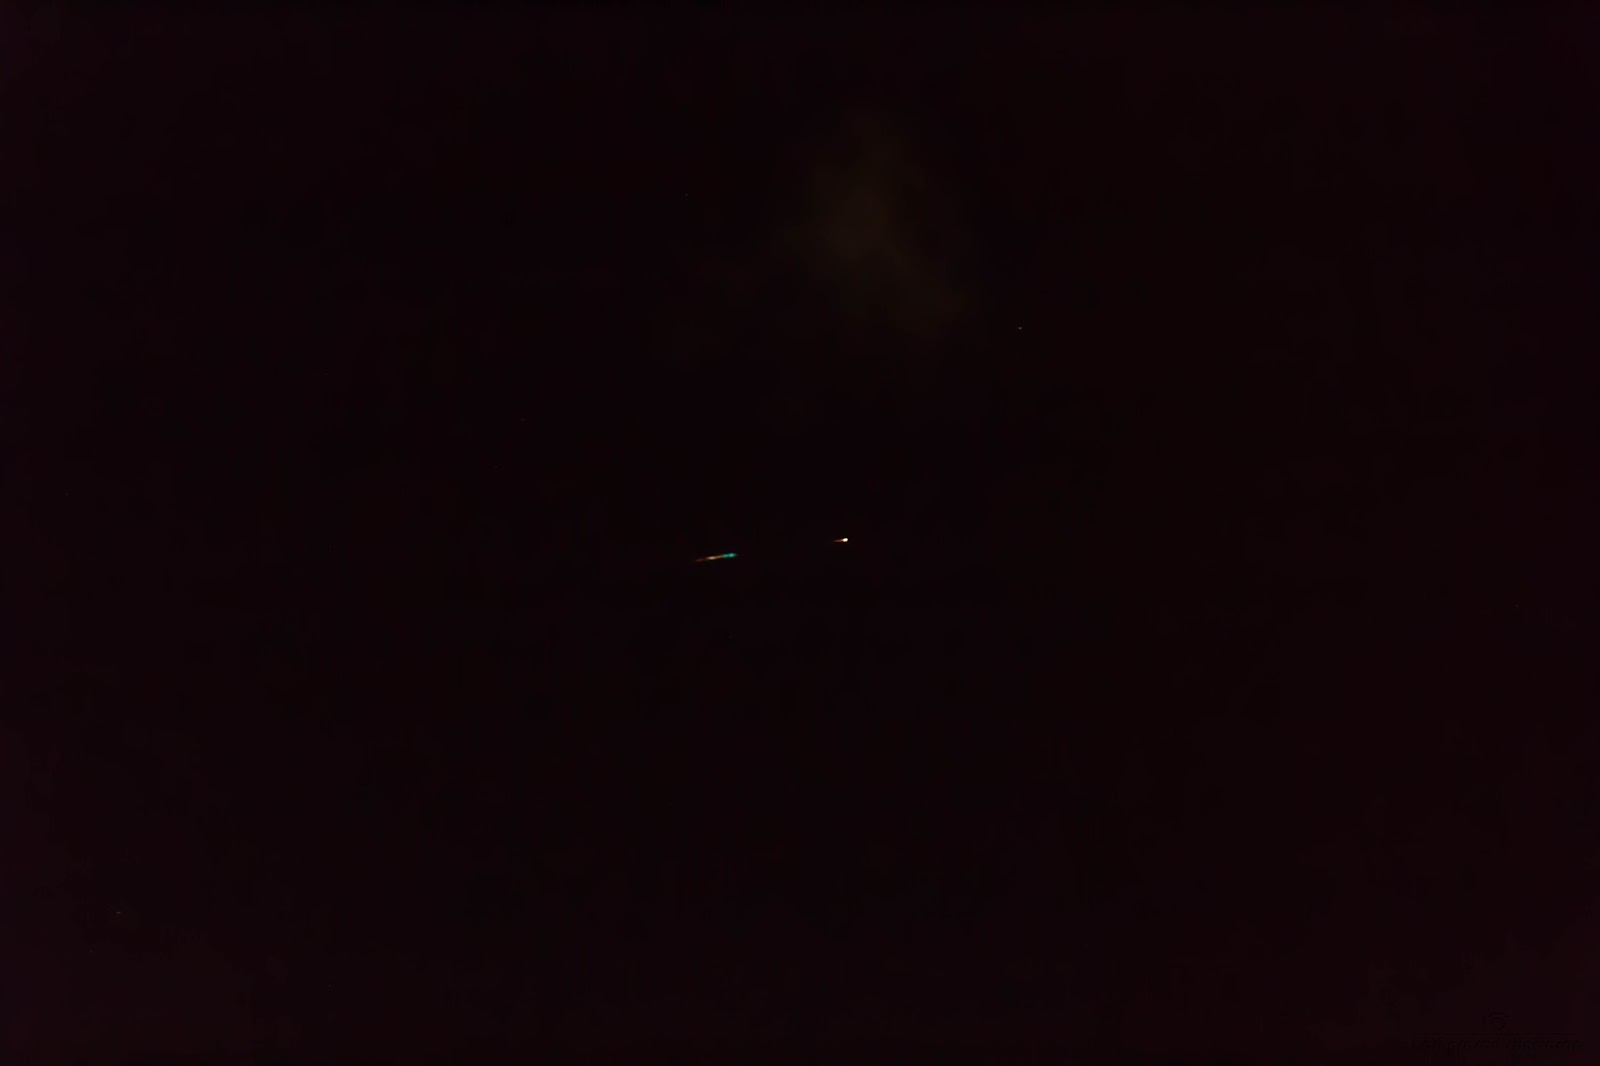 Image 6 - Meteor - Chennai, India, 16.October.2014 1.36 am IST